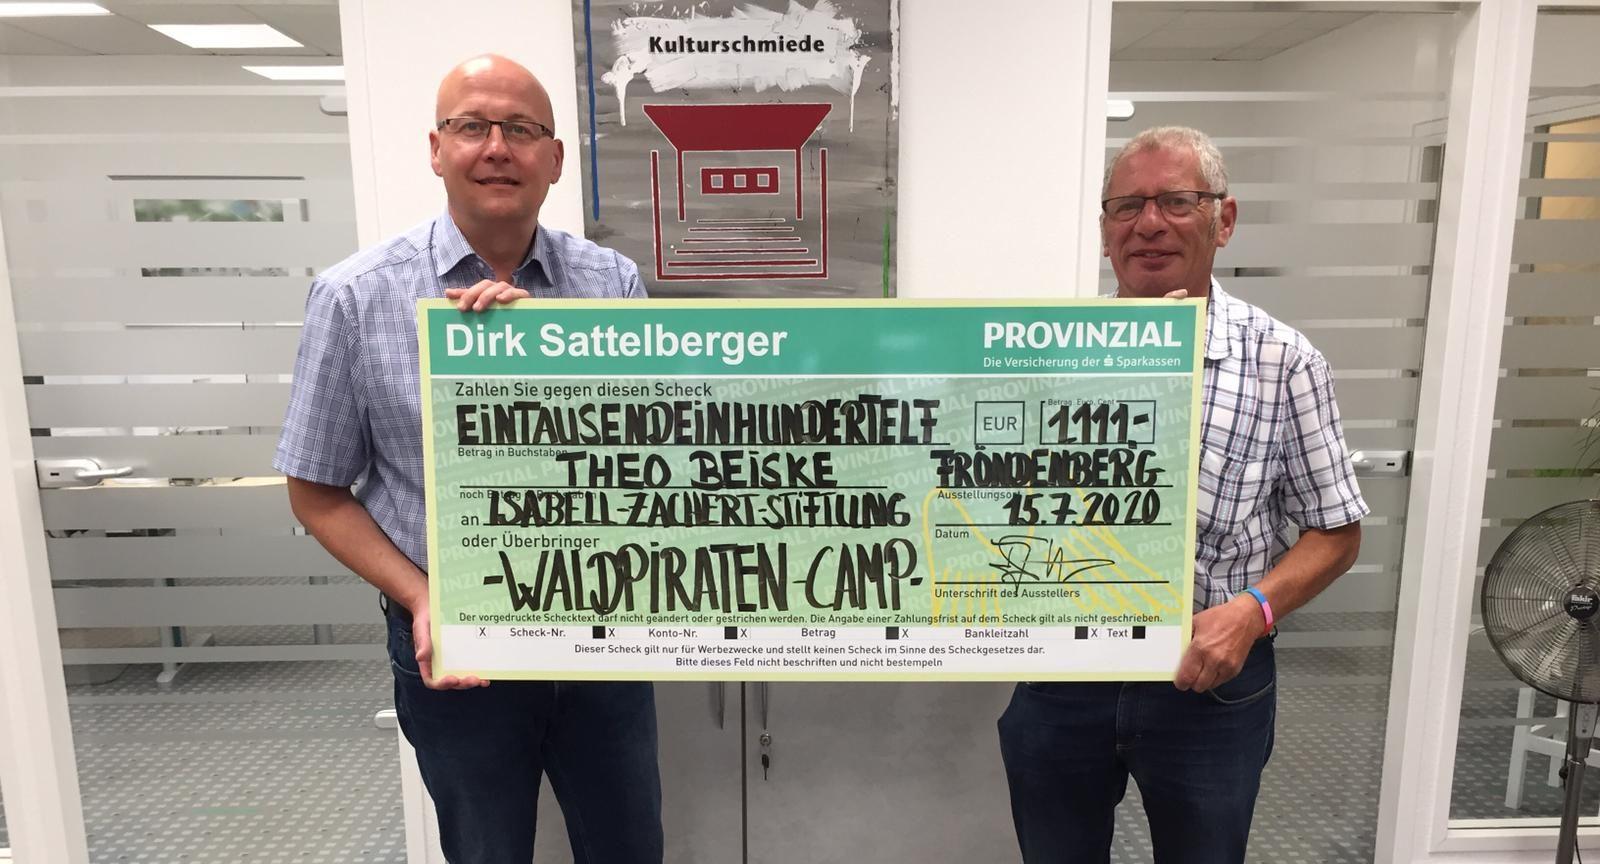 sattelberger_provinzial